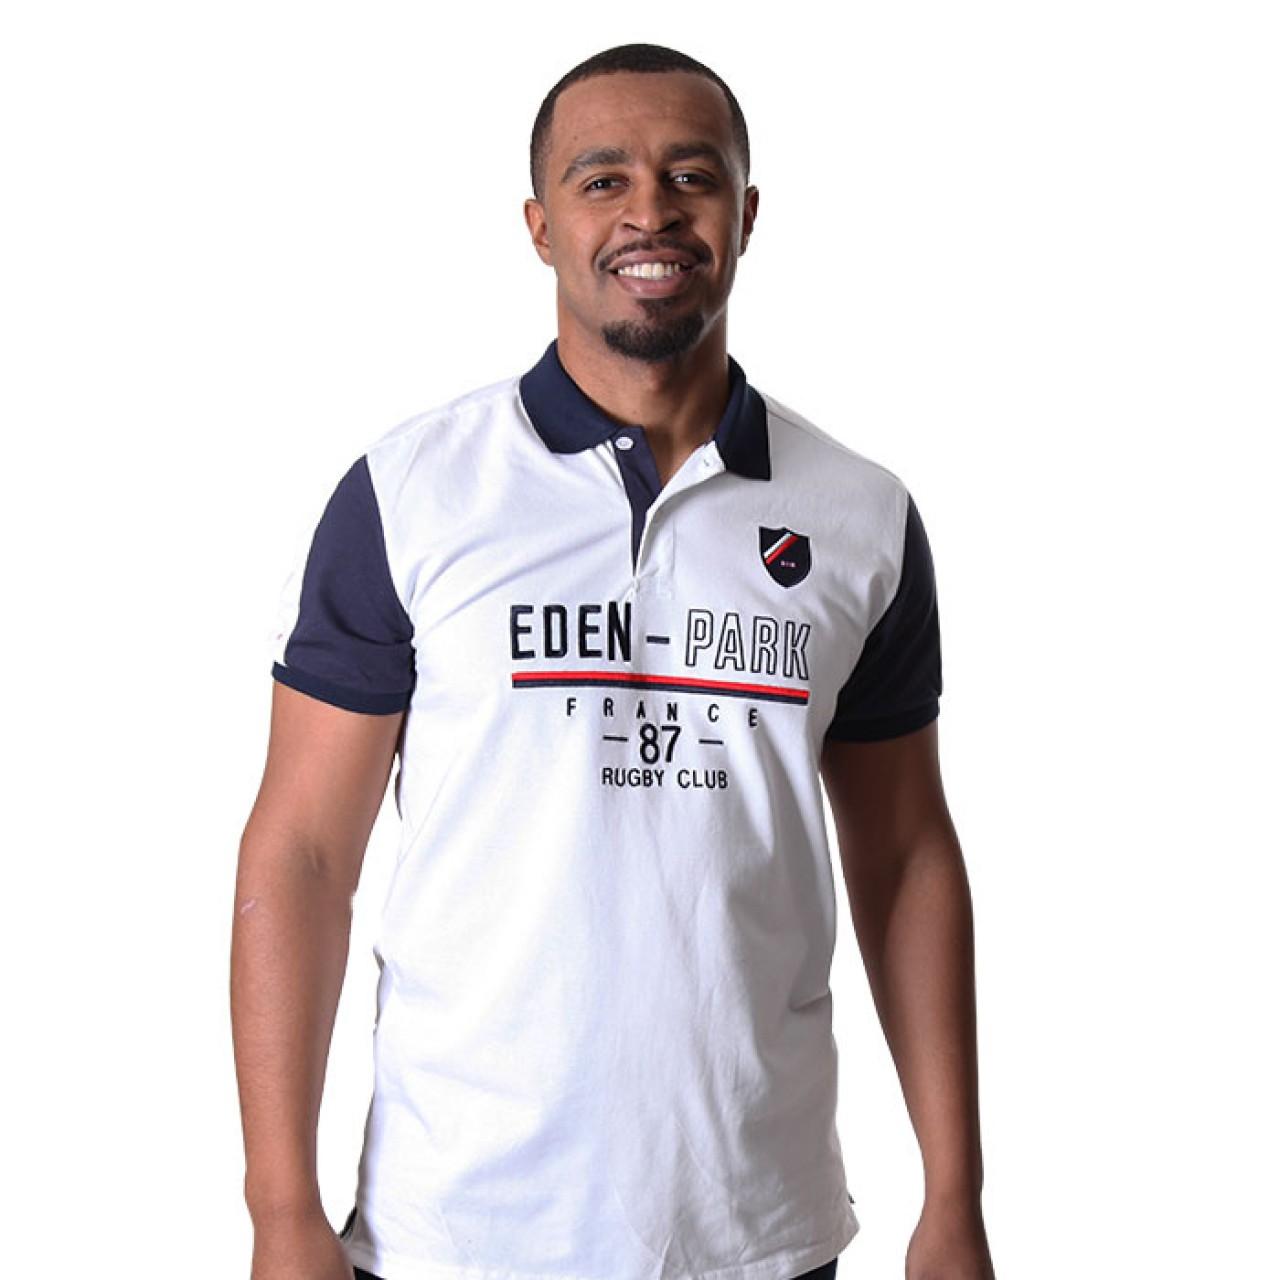 Men's Rugby Club EDEN-PARK White Tees